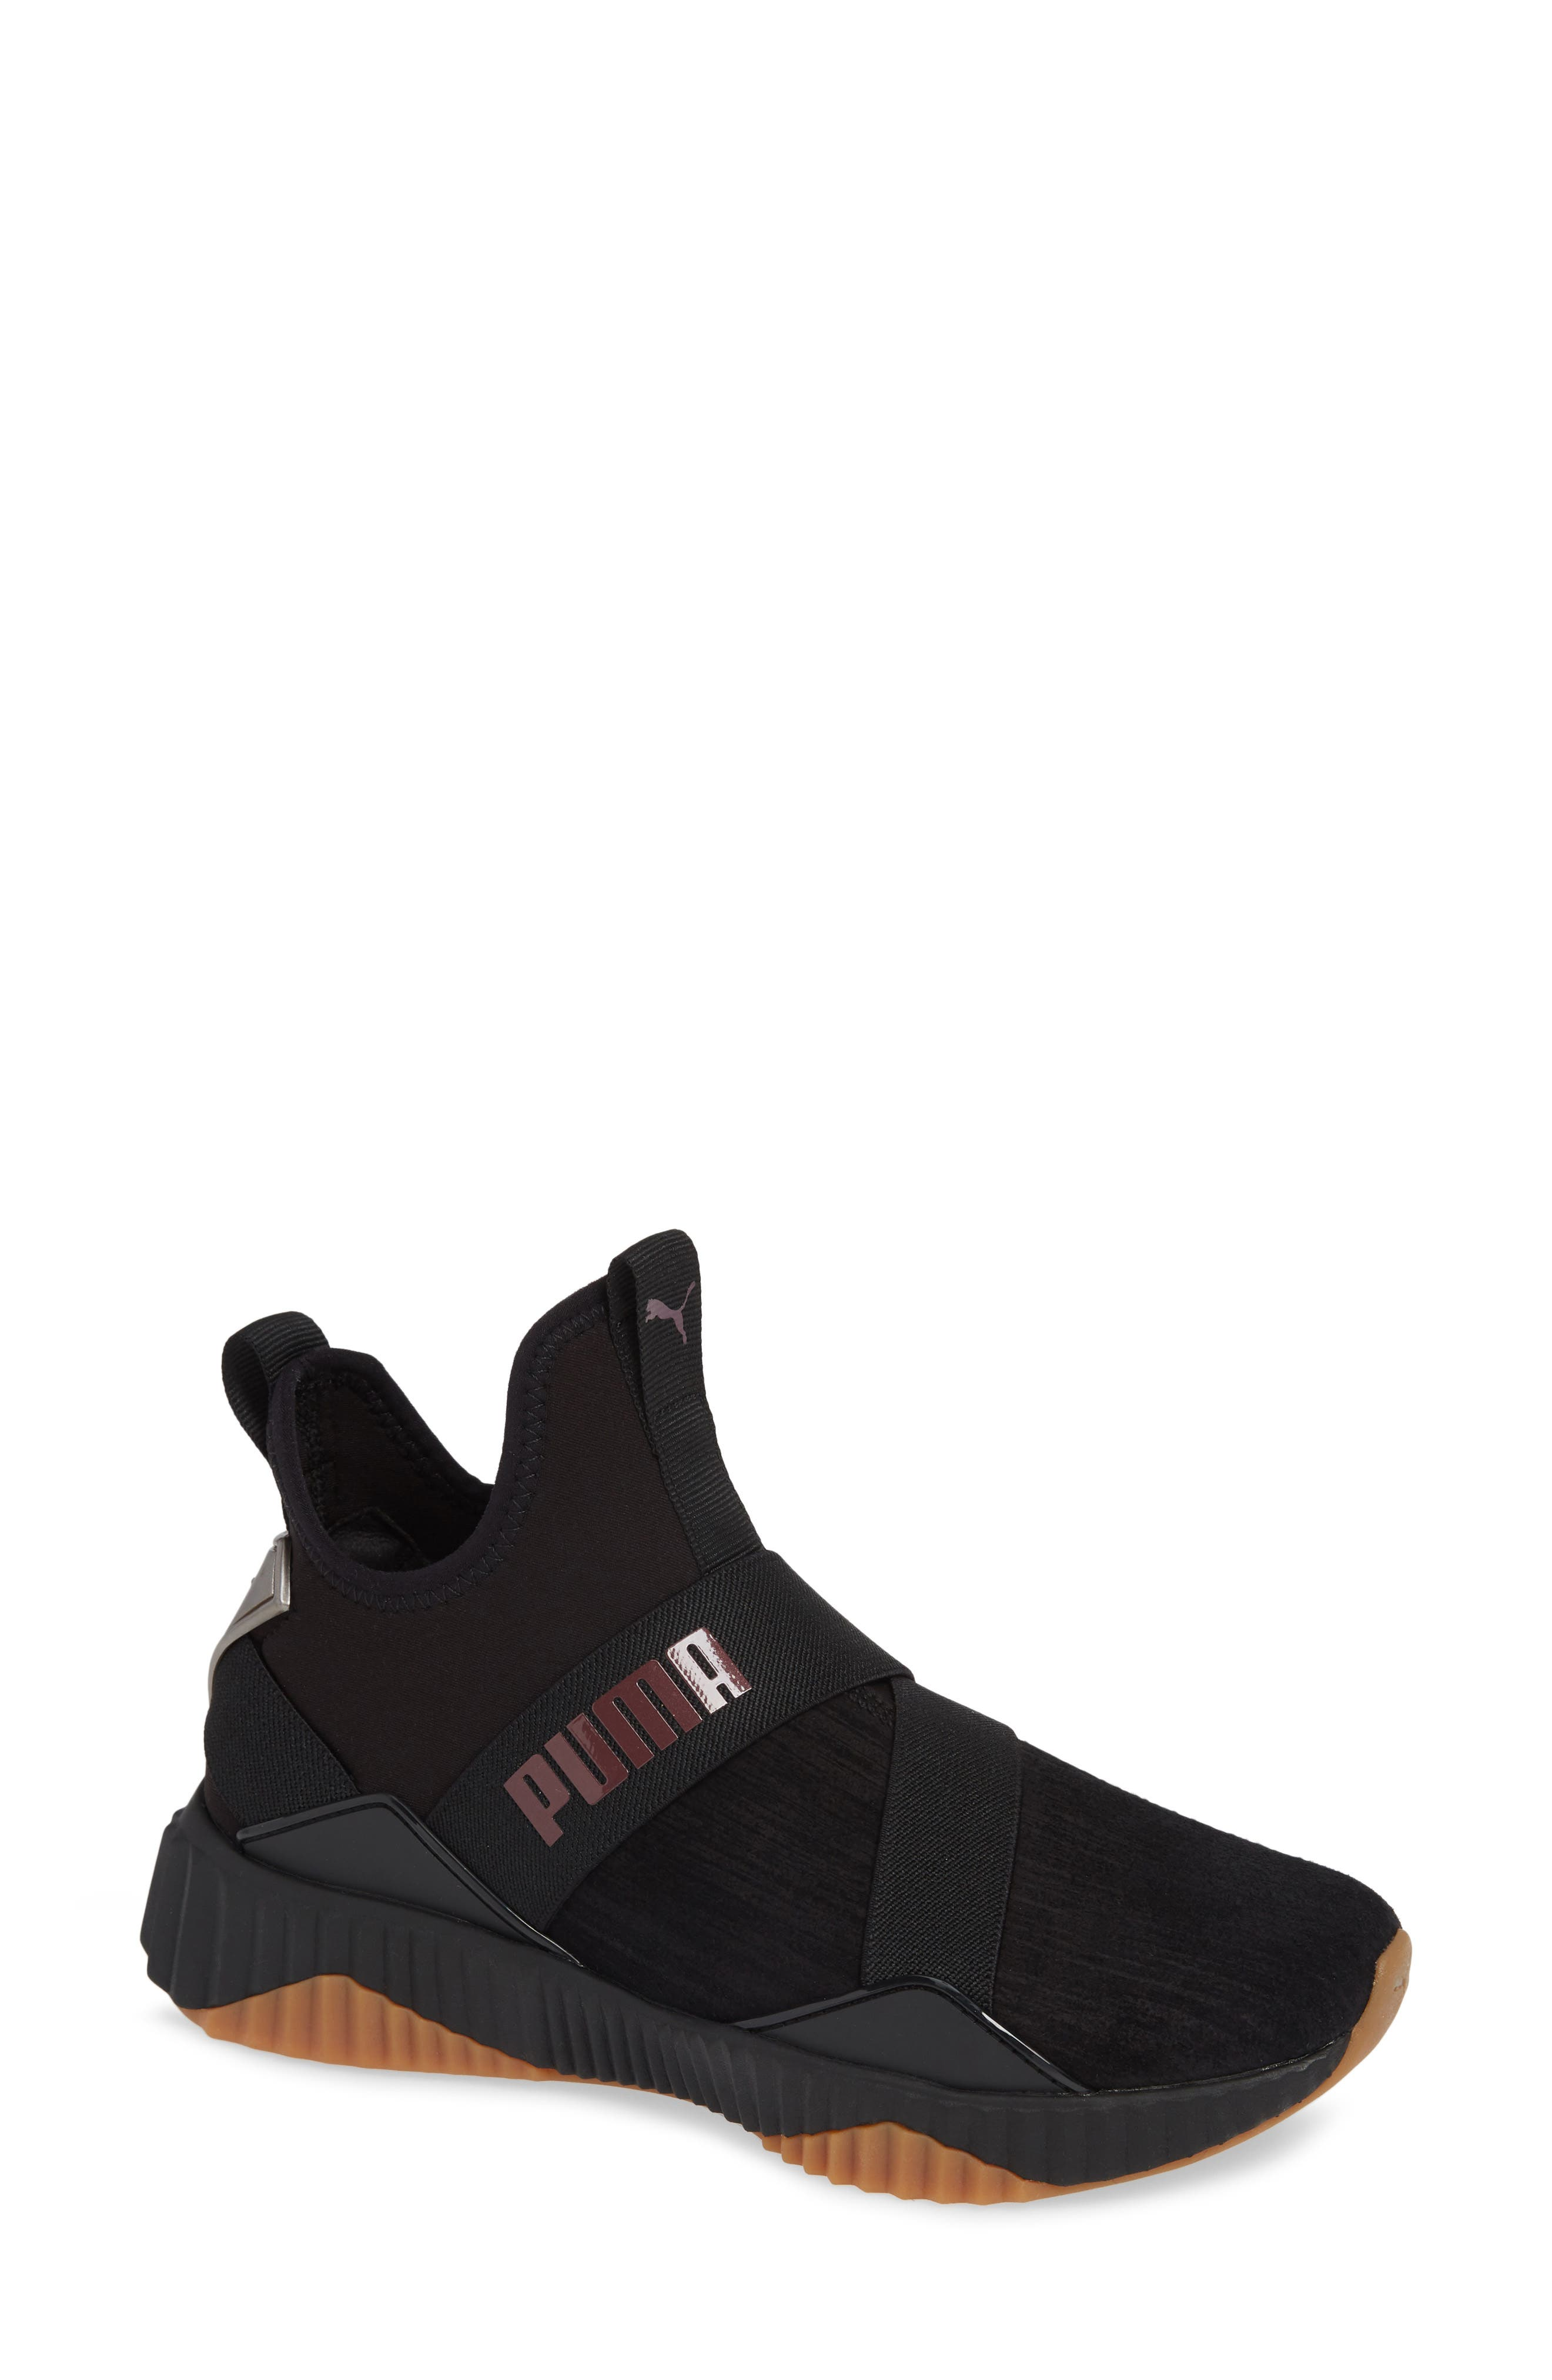 a9312d8a133 ... inexpensive puma defy mid luxe sneaker women 18024 7165a